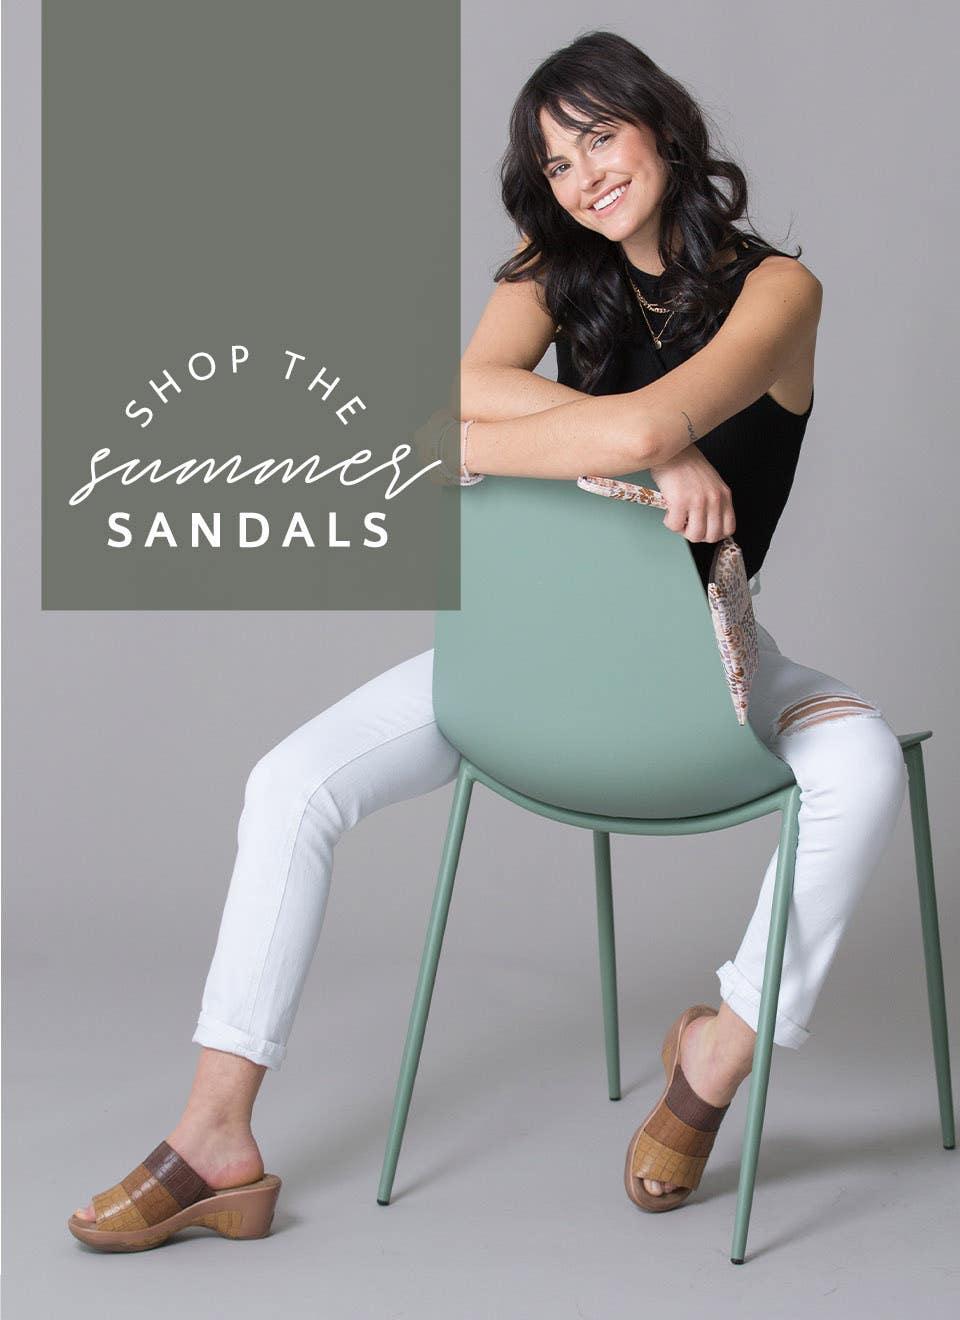 Shop The Summer Sandals